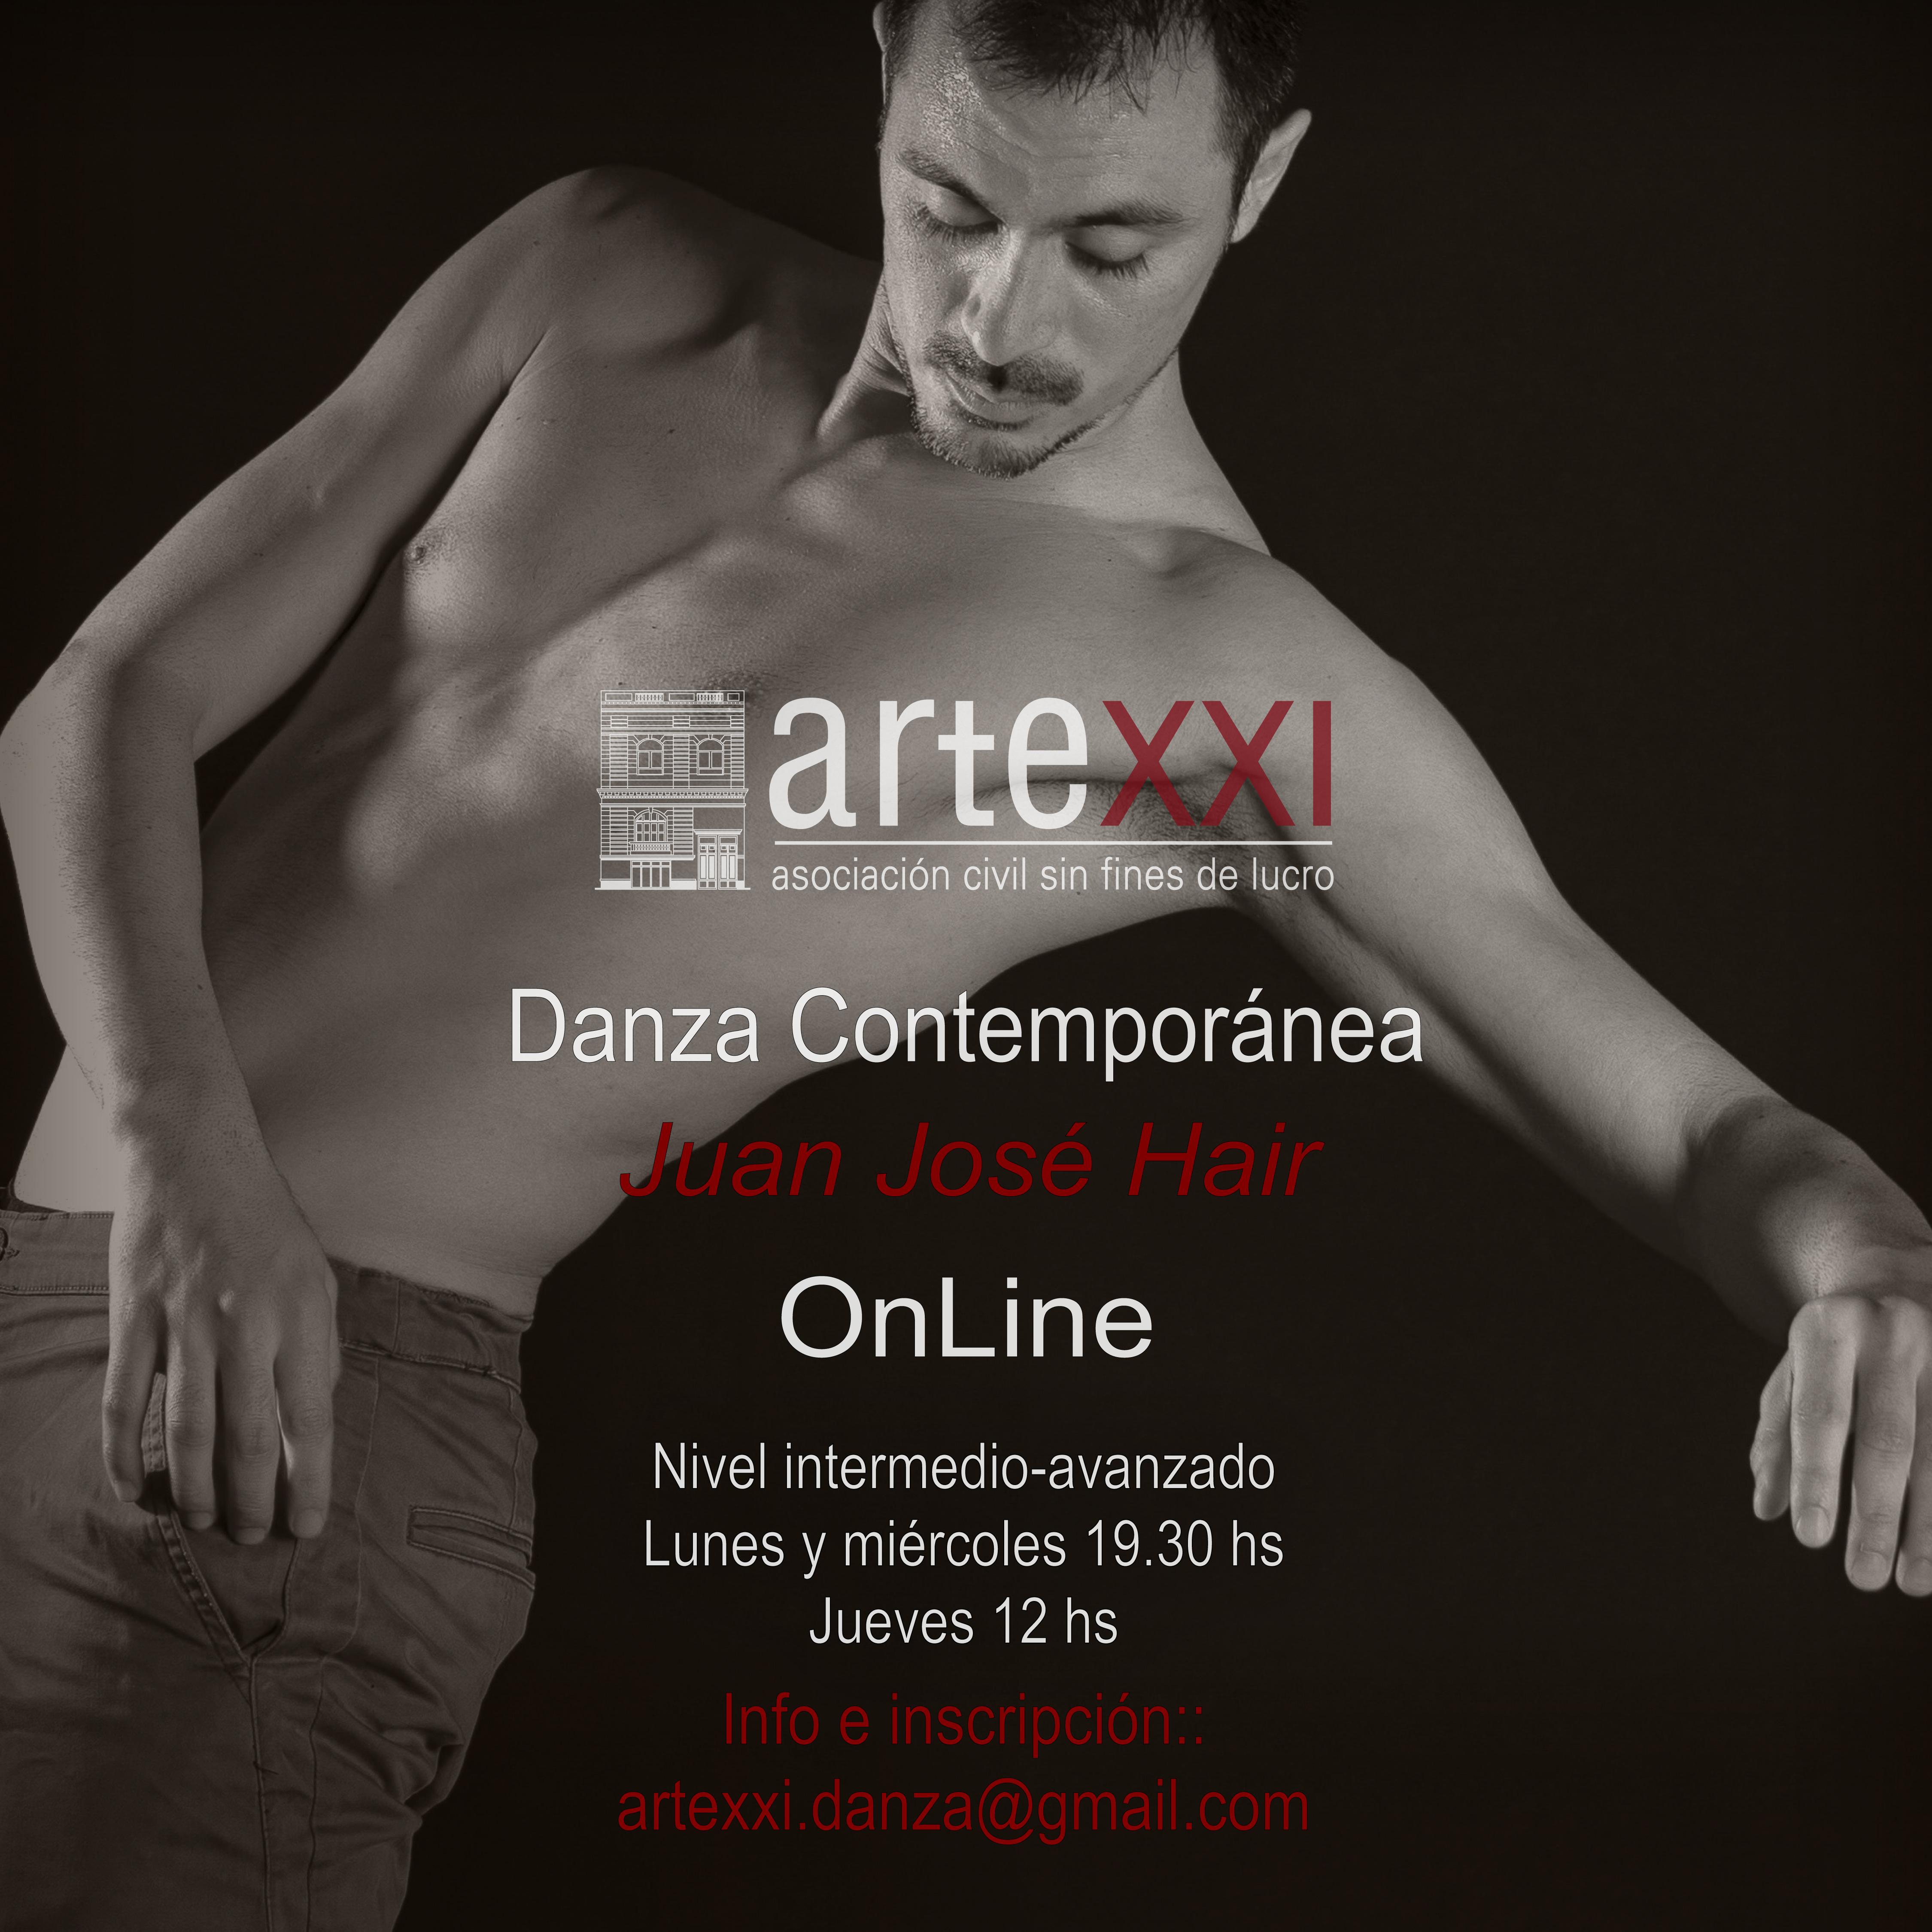 Danza Contemporánea OnLine